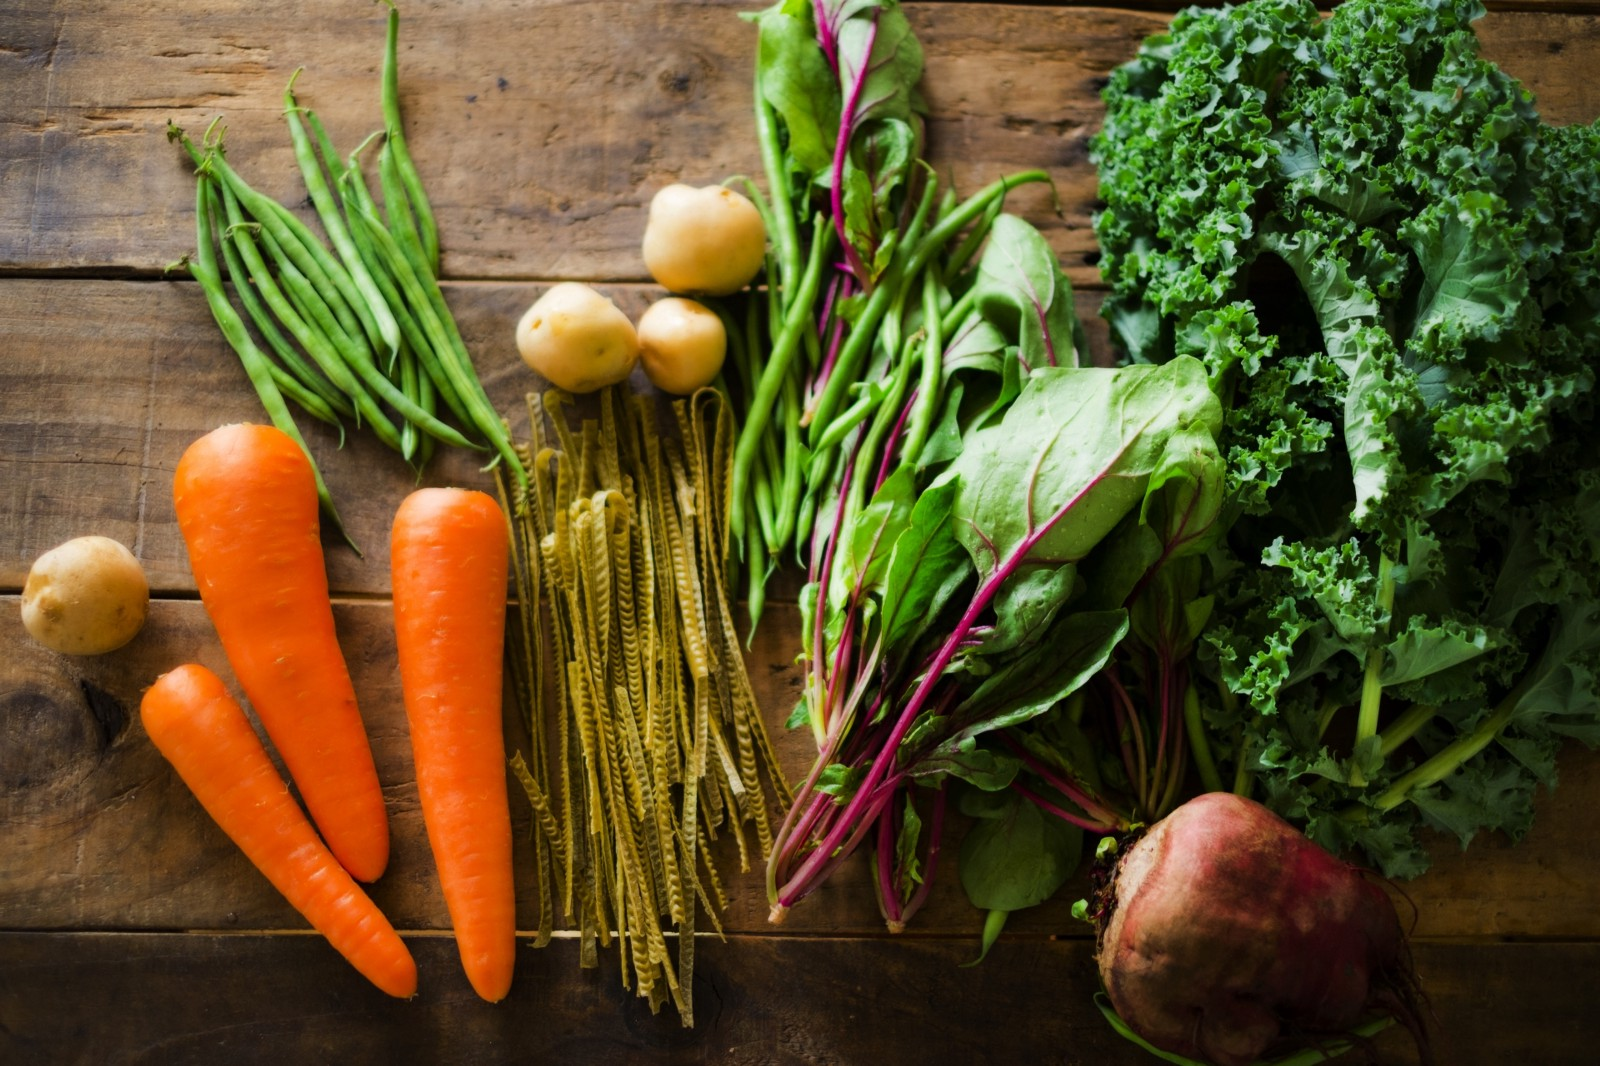 5 Best Organic and Vegan Food Restaurants in Shibuya, Tokyo